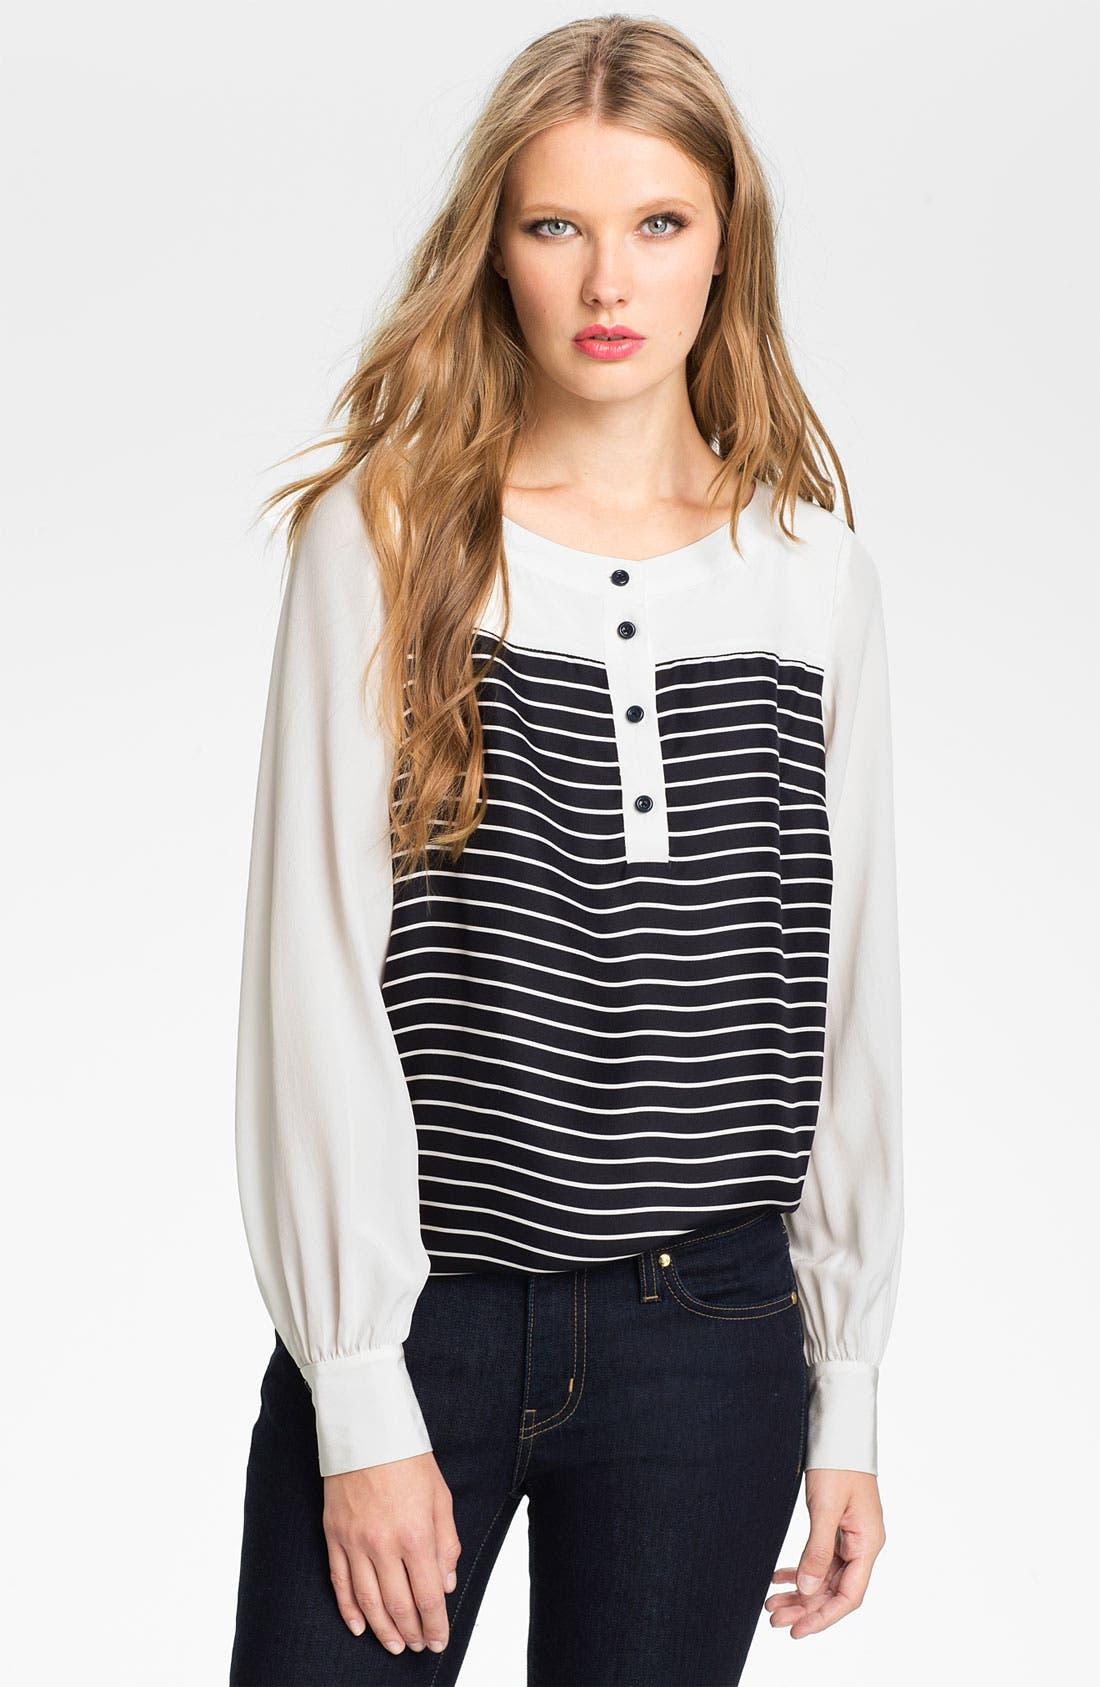 Main Image - kate spade new york 'leanne' silk blouse